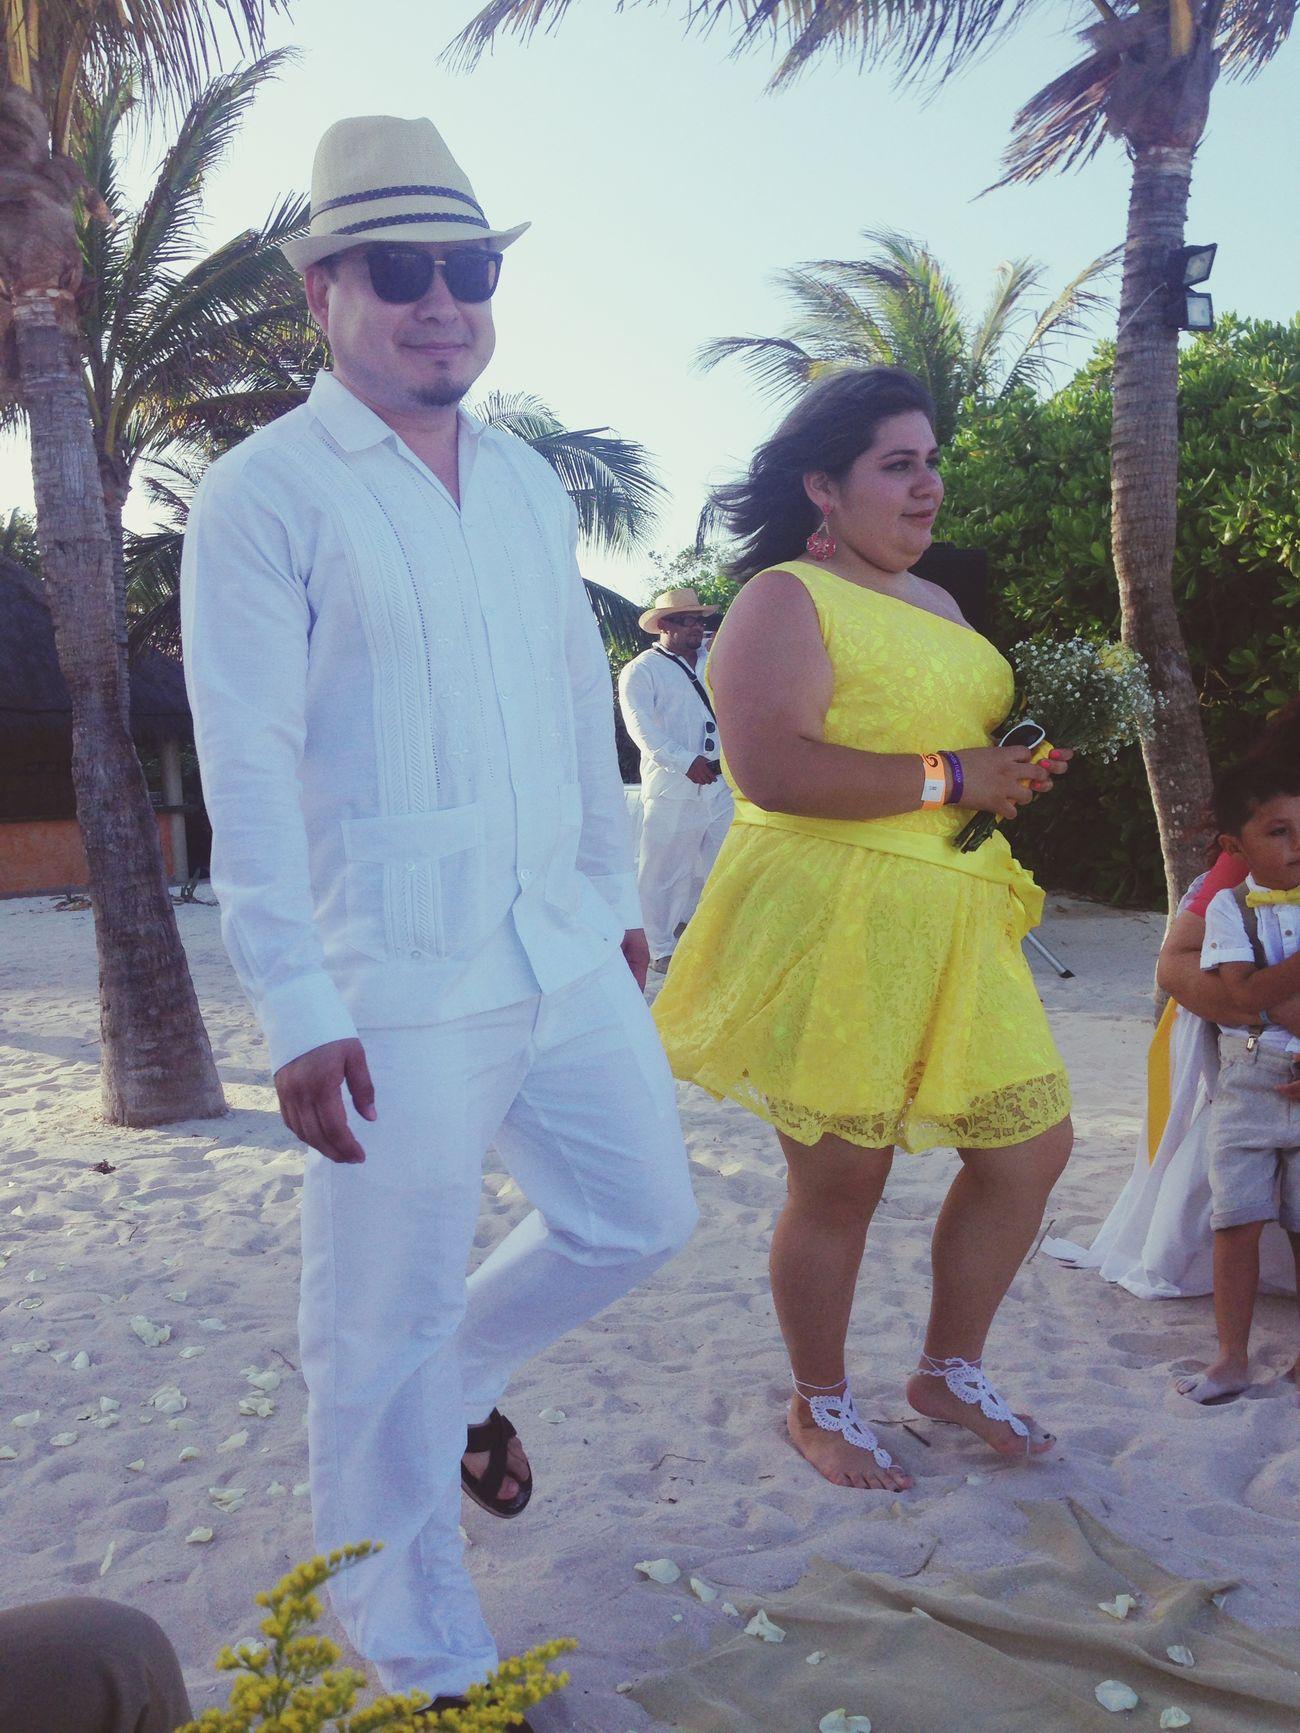 ¡El damo más guapo! 😍 Wedding Beach Riviera Maya Beachwedding Boyfriend